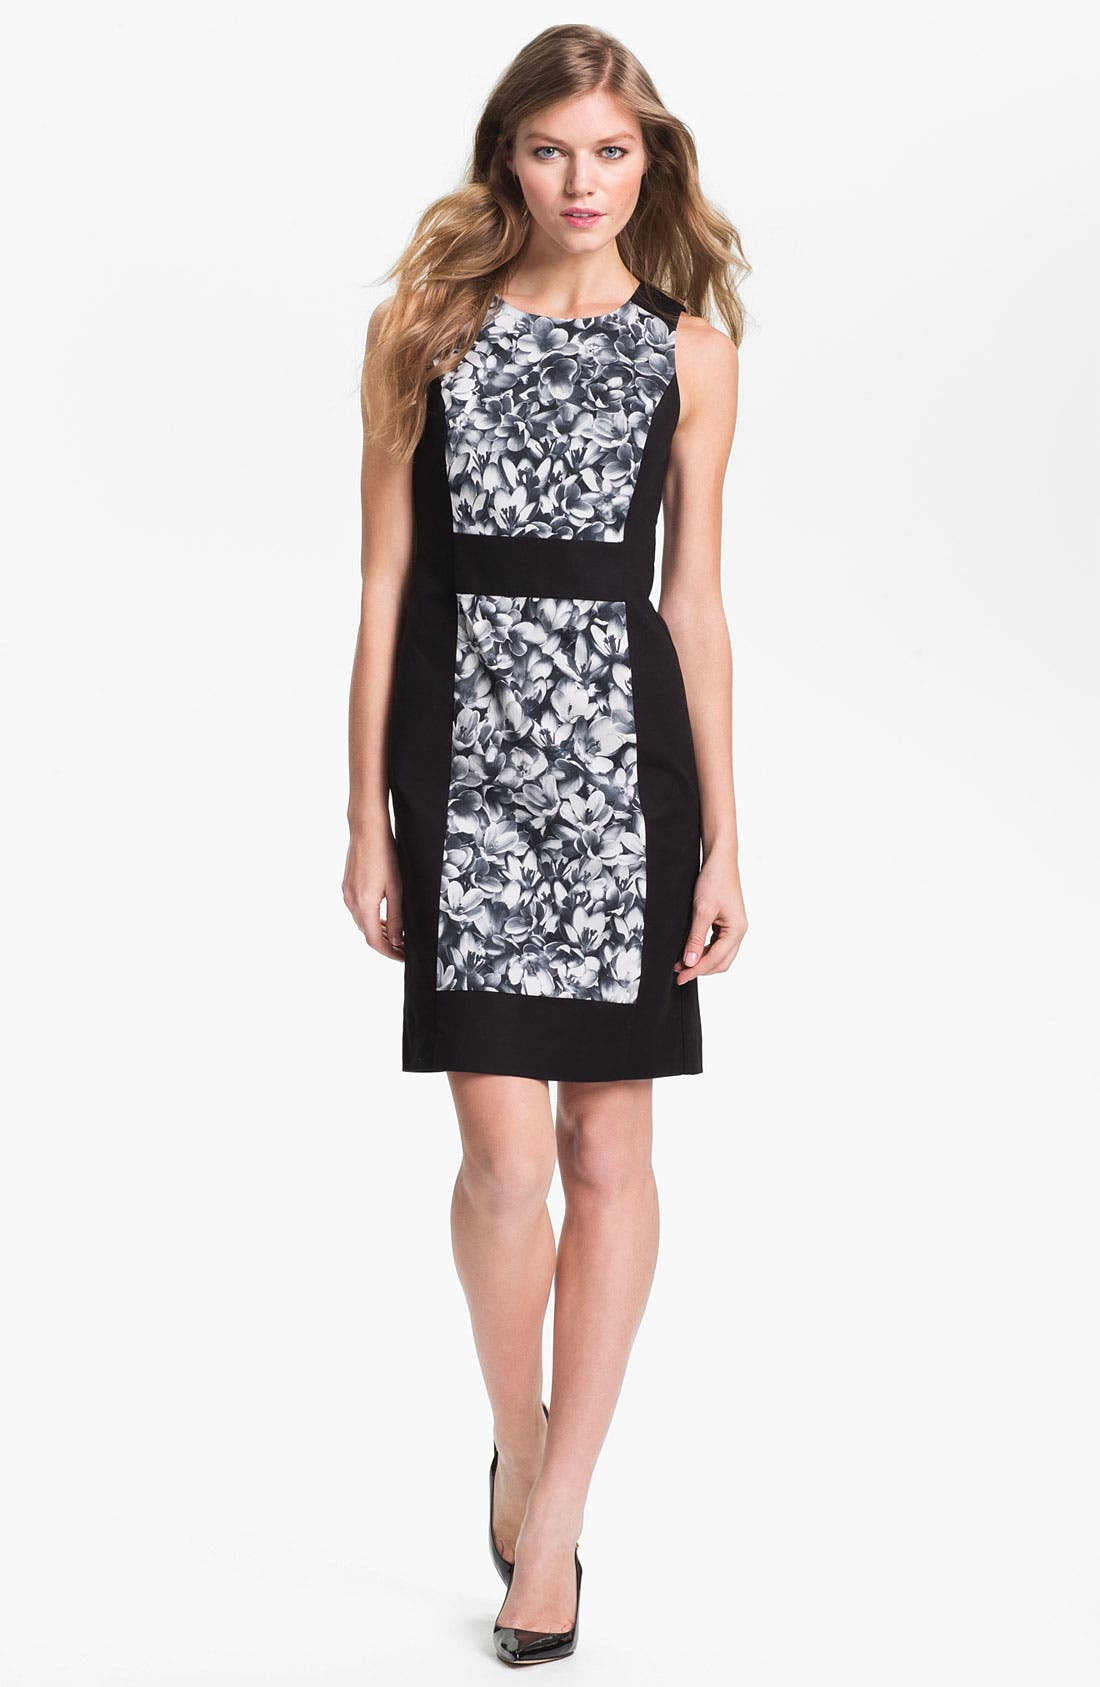 Alternate Image 1 Selected - MICHAEL Michael Kors Sleeveless Colorblock Dress